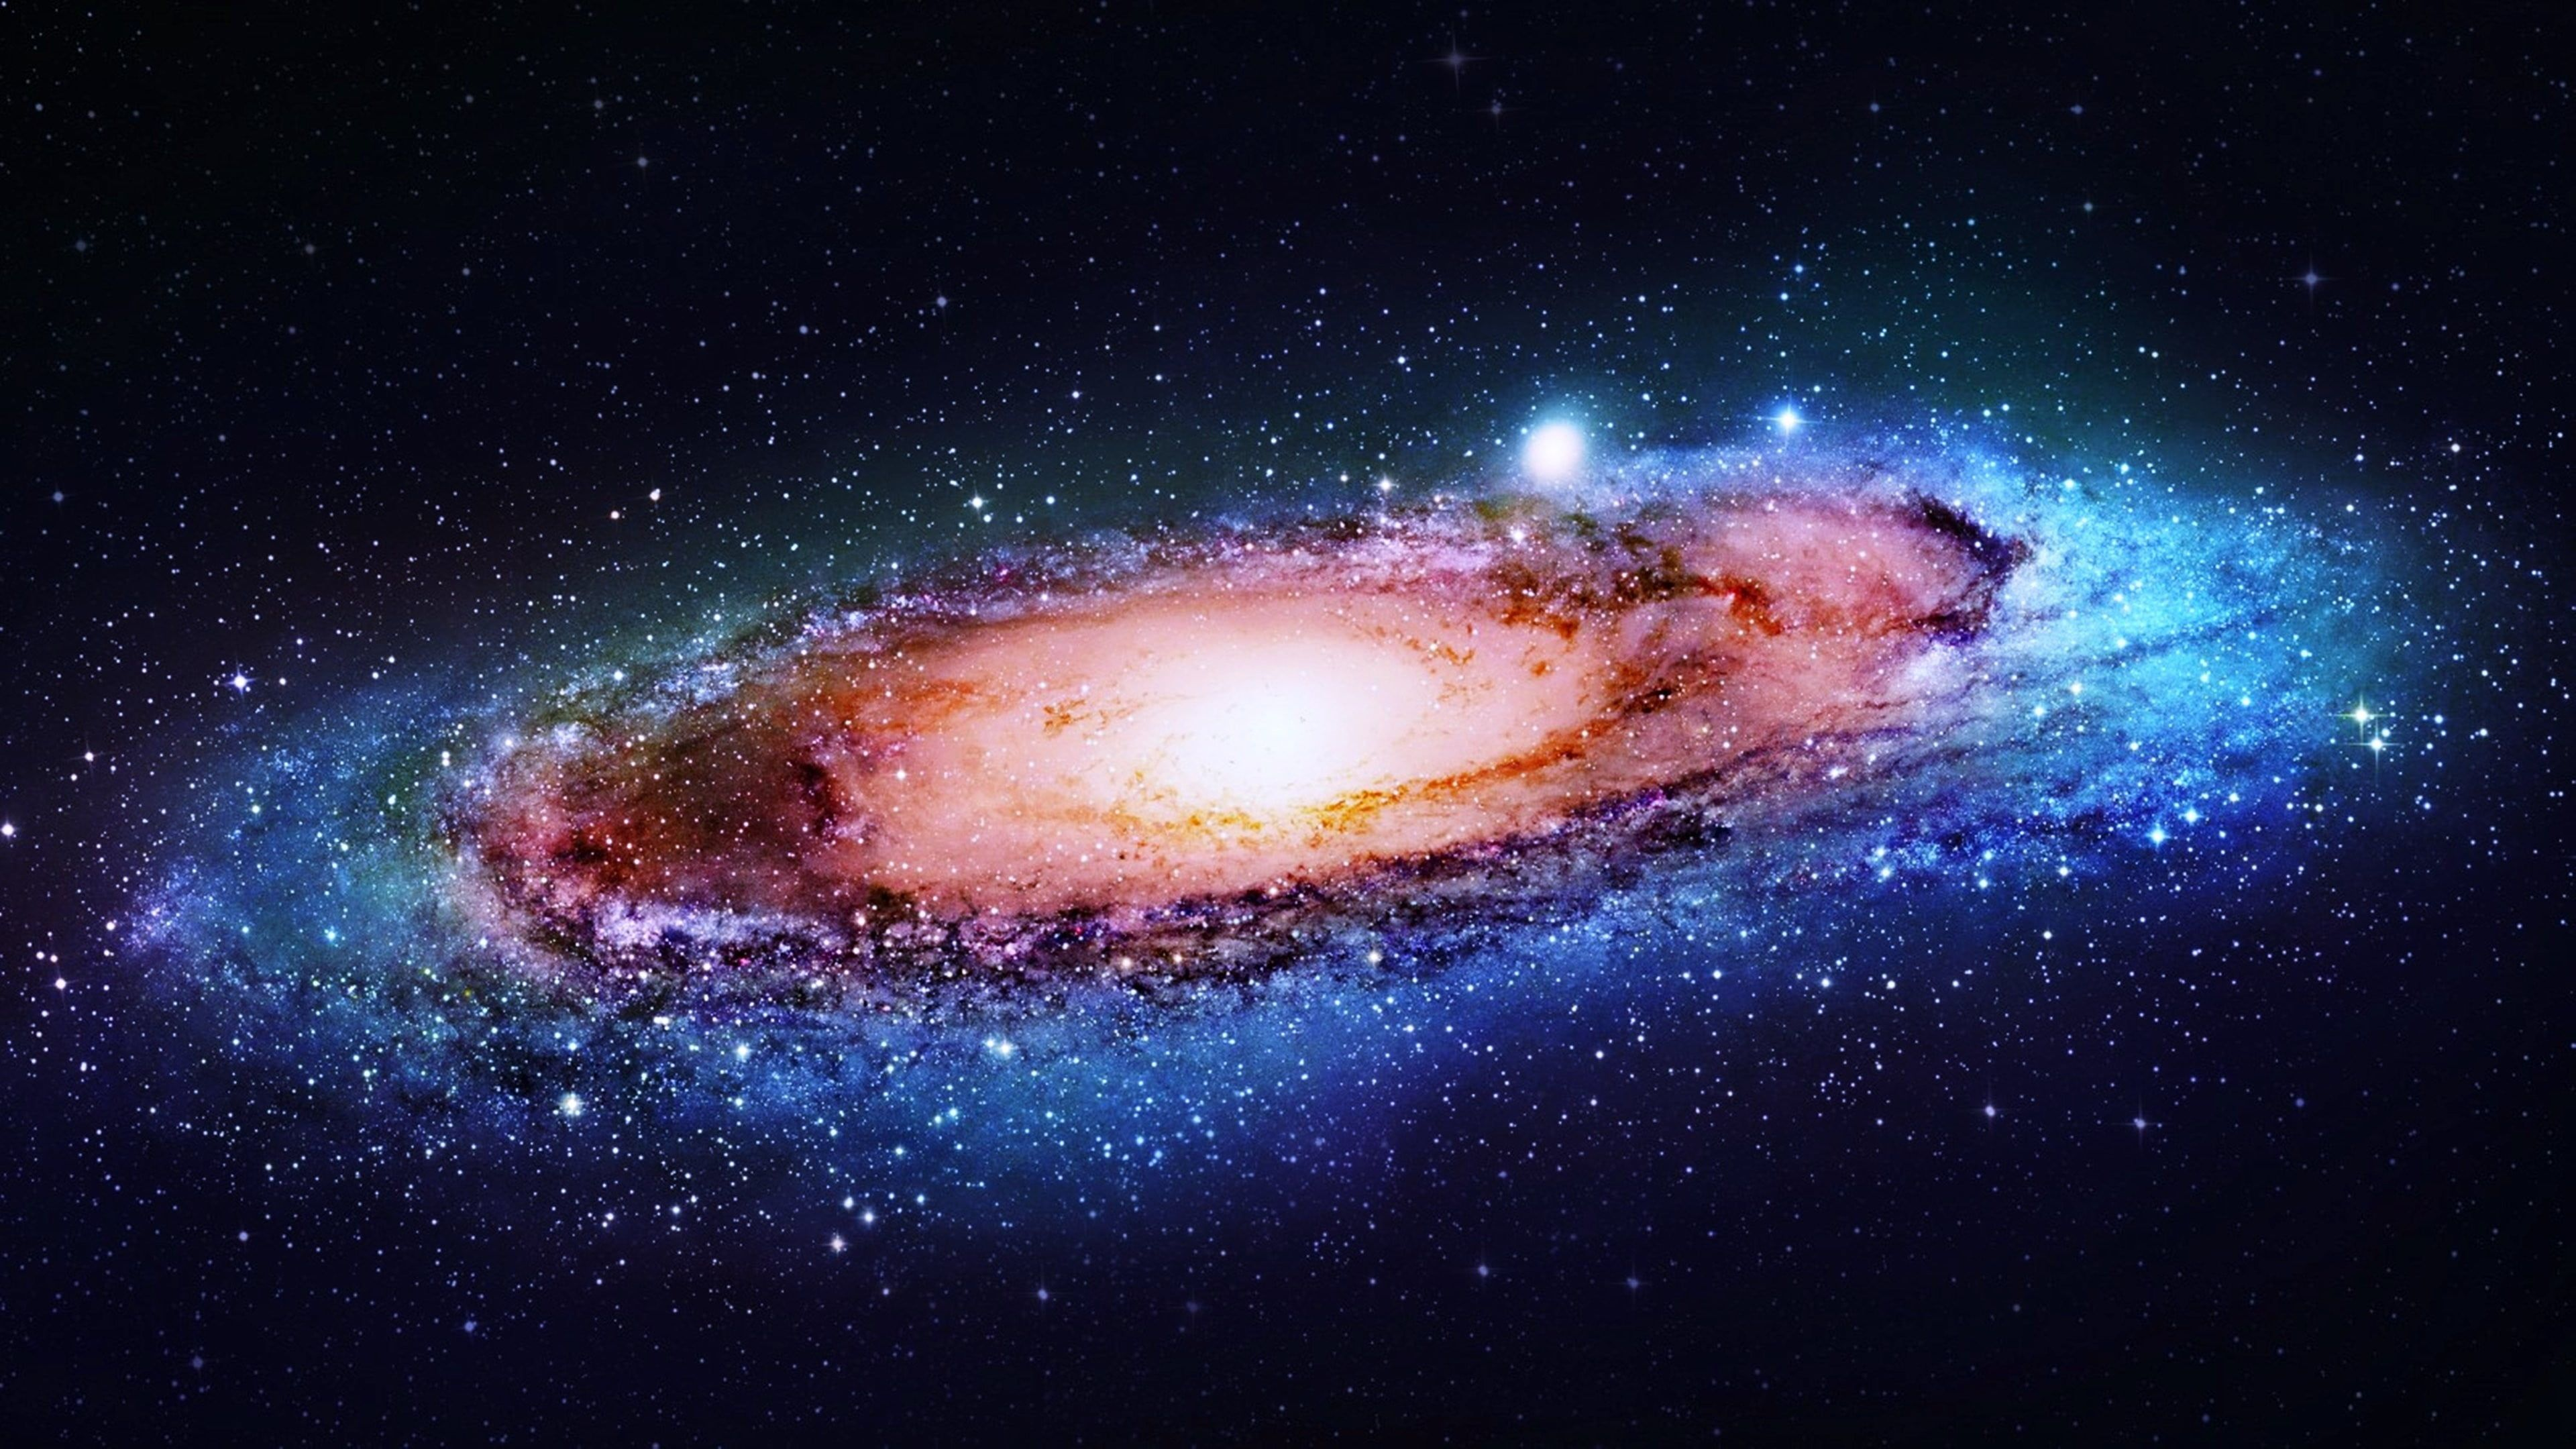 Milky Way Wallpaper Stars Space Galaxy Nebula 4k Wallpaper Hdwallpaper Desktop In 2020 Galaxy Wallpaper Milky Way Galaxy Milky Way